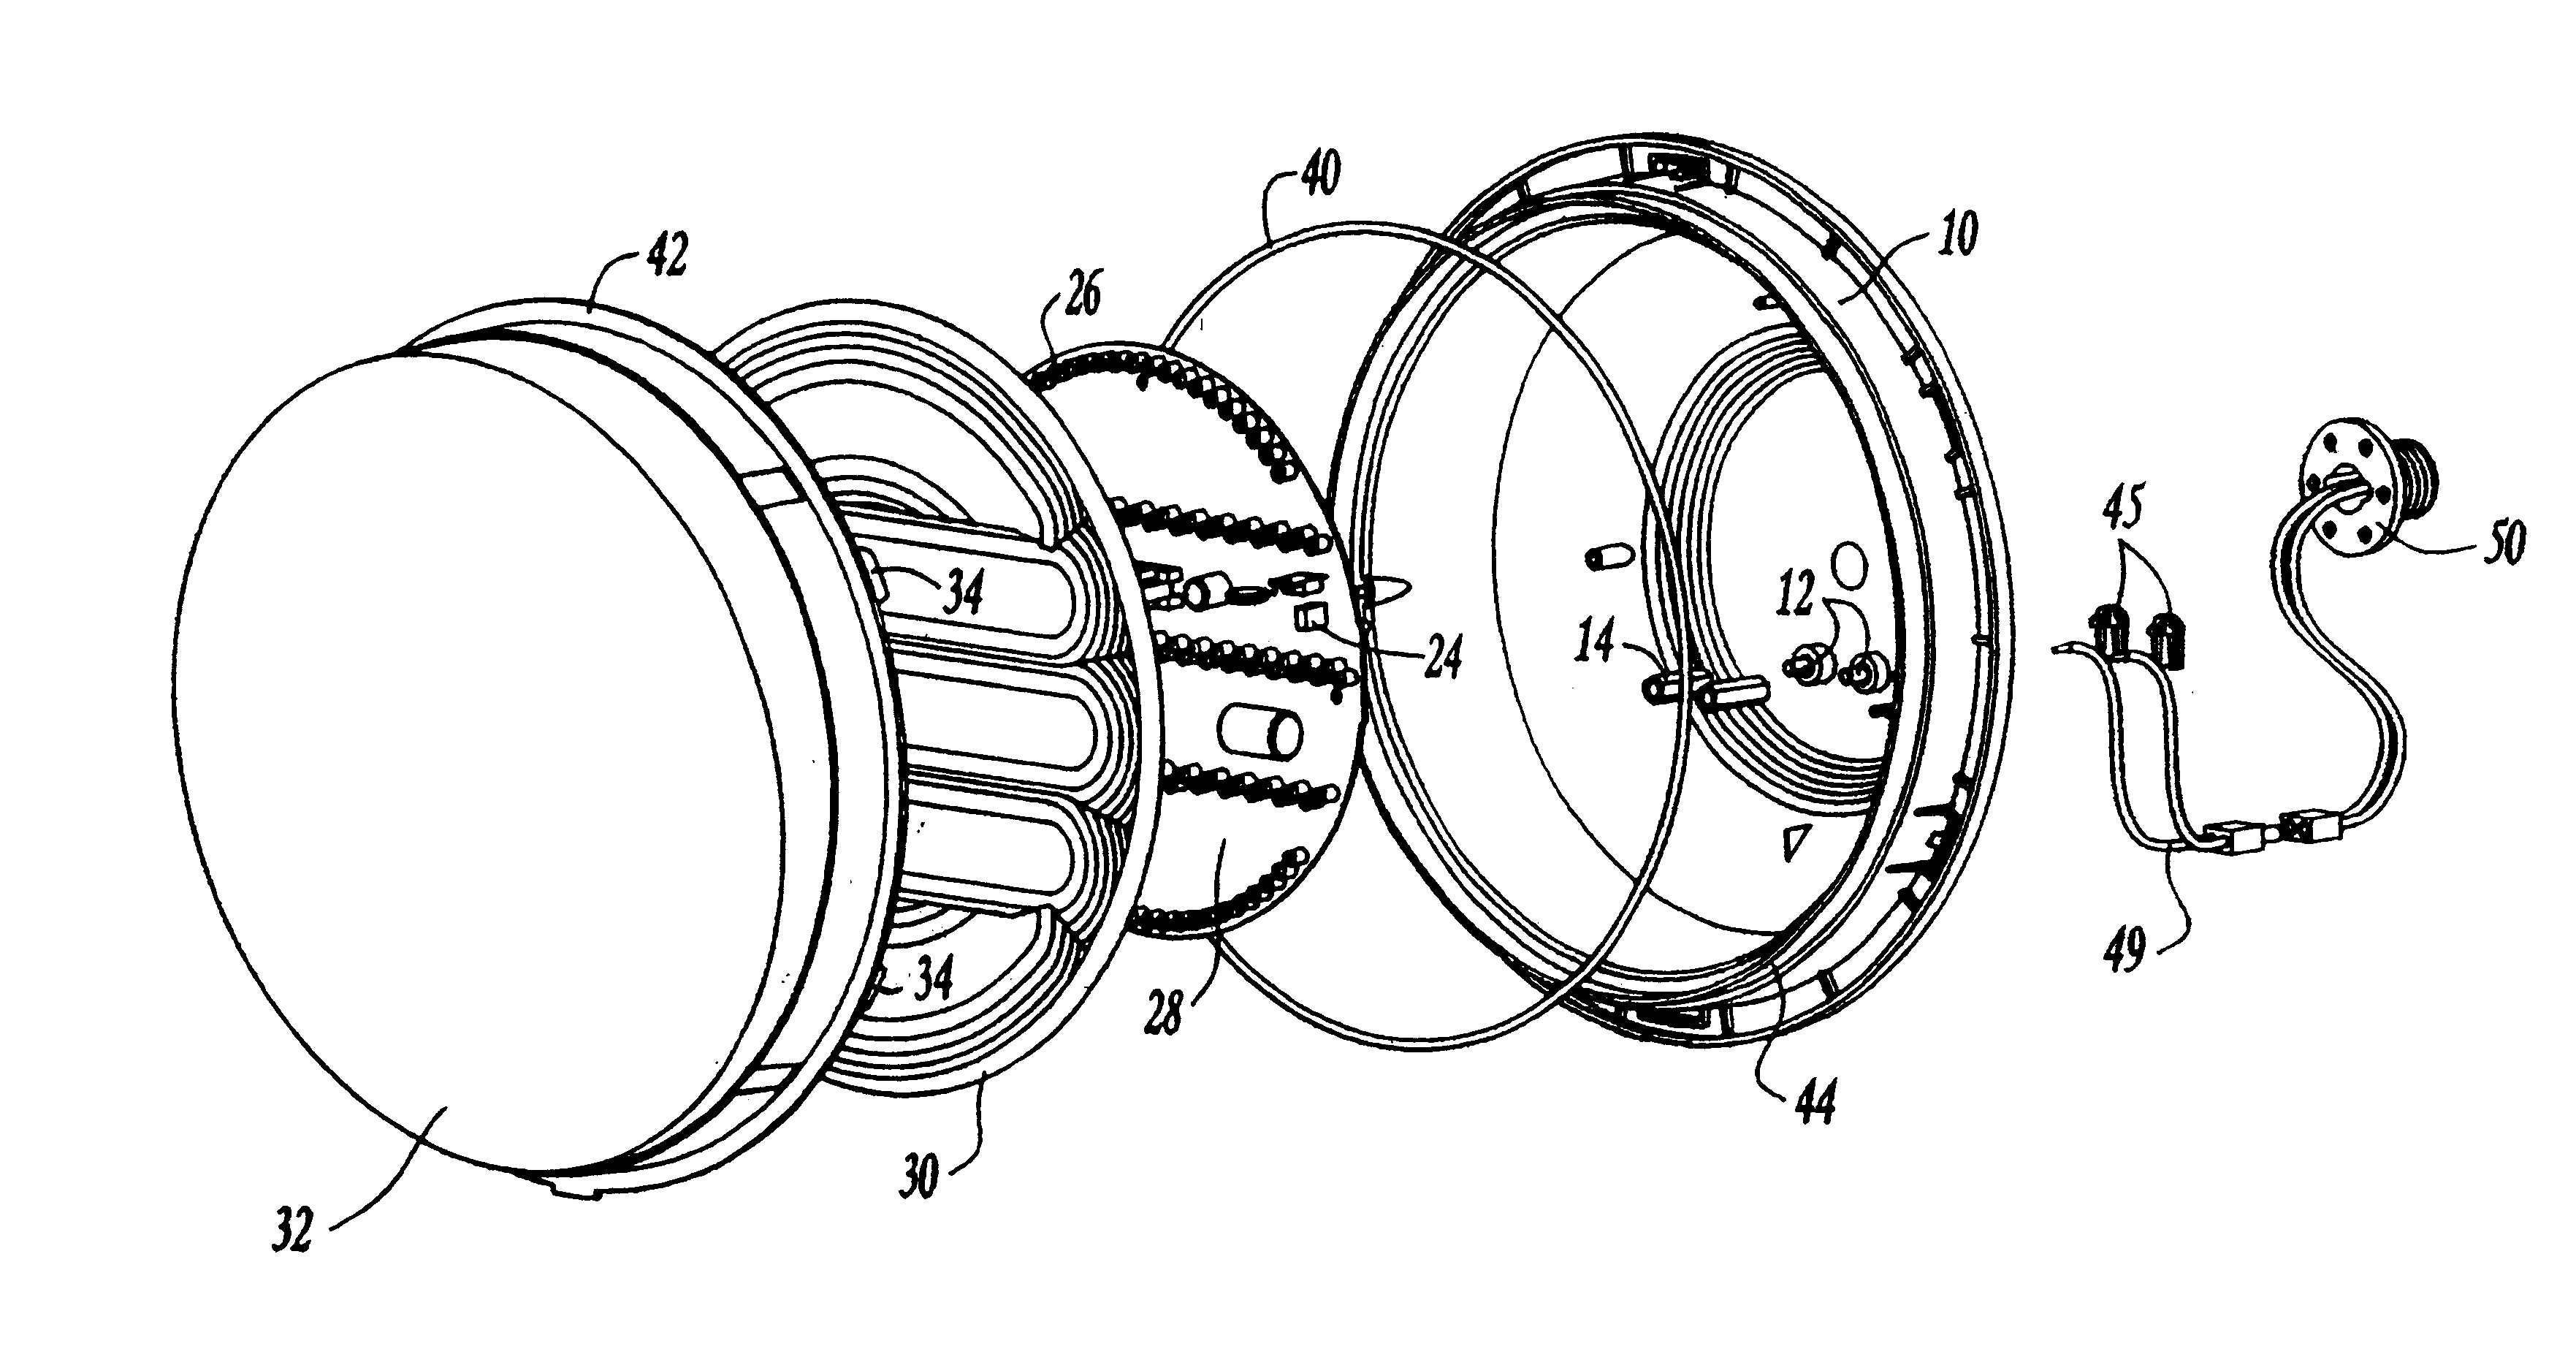 patent us6509840 - sun phantom led traffic signal